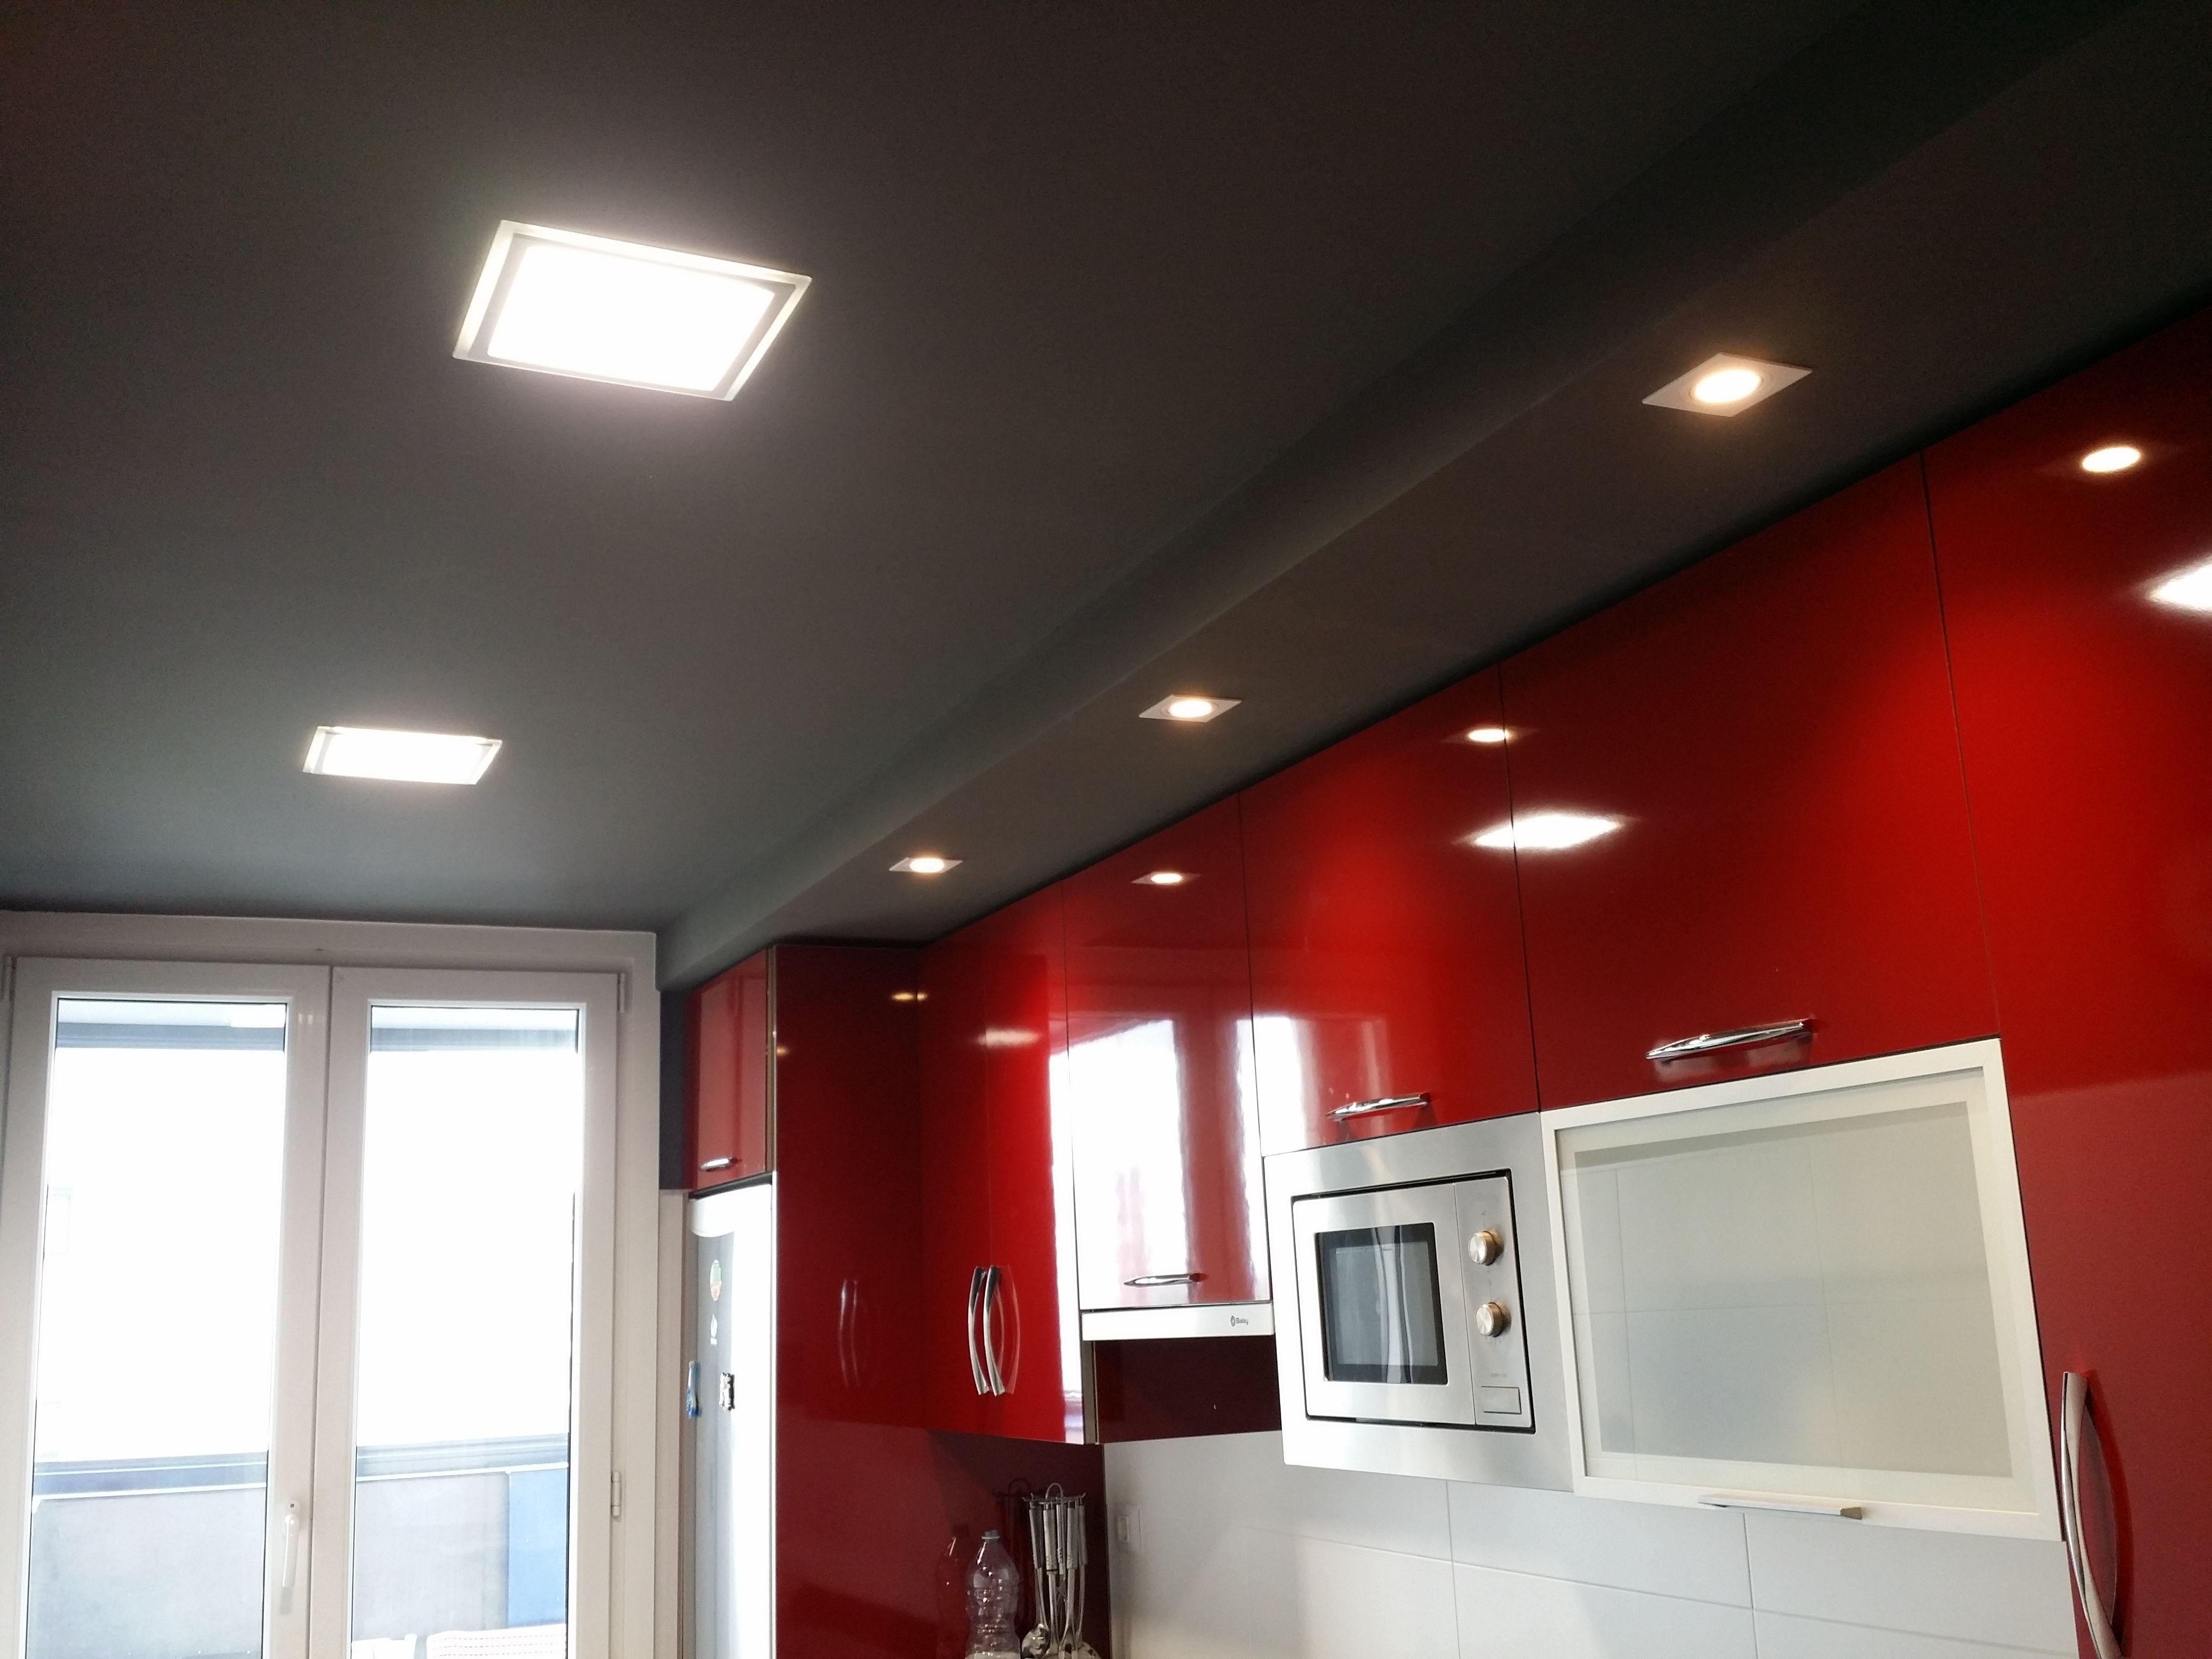 Proyecto de iluminacion de cocina con Downlight LED de Maslighting ...